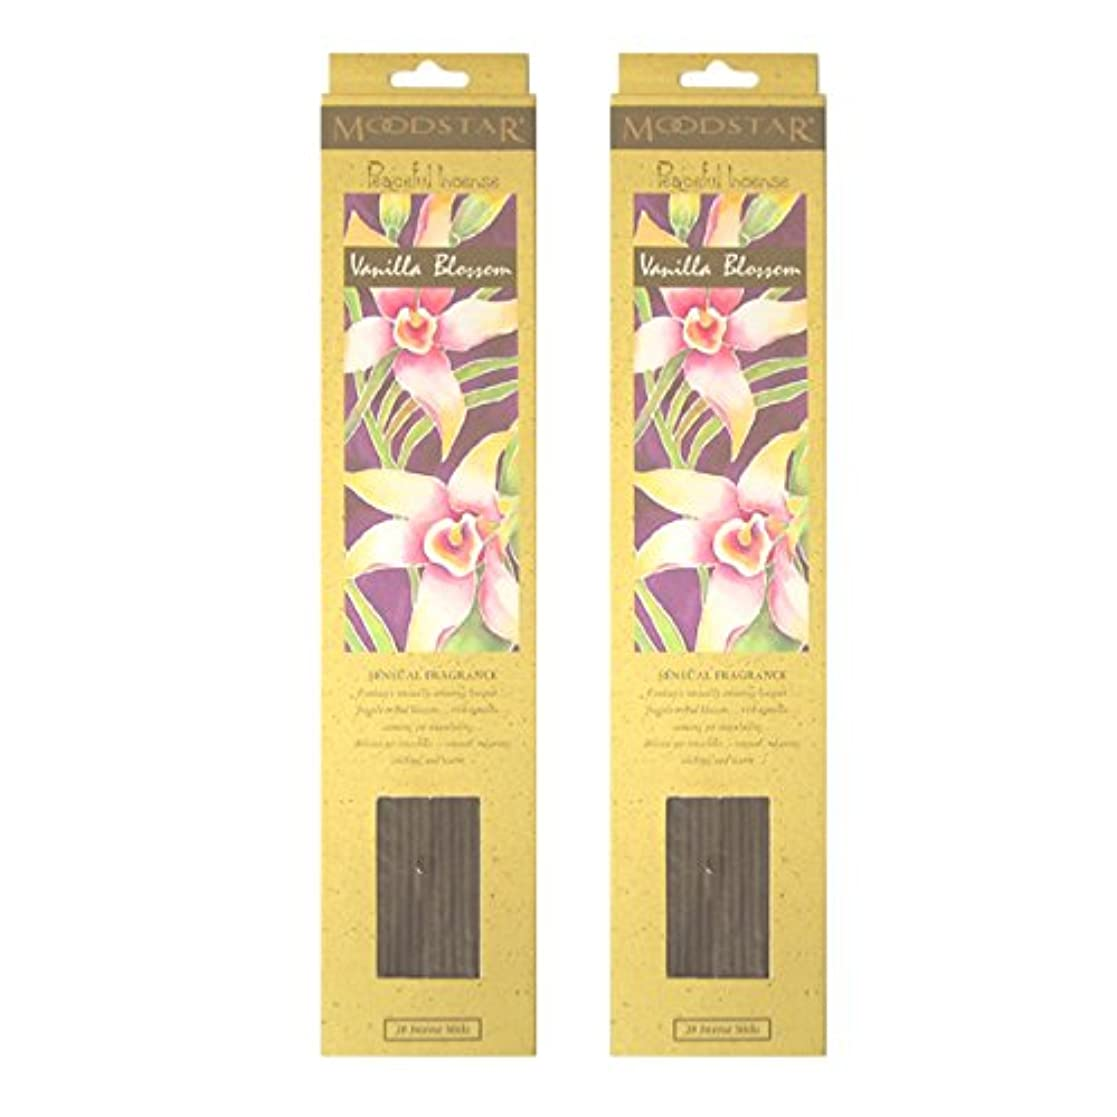 MOODSTAR ムードスター Vanilla Blossom バニラ?ブロッサム お香 20本 X 2パック (40本)